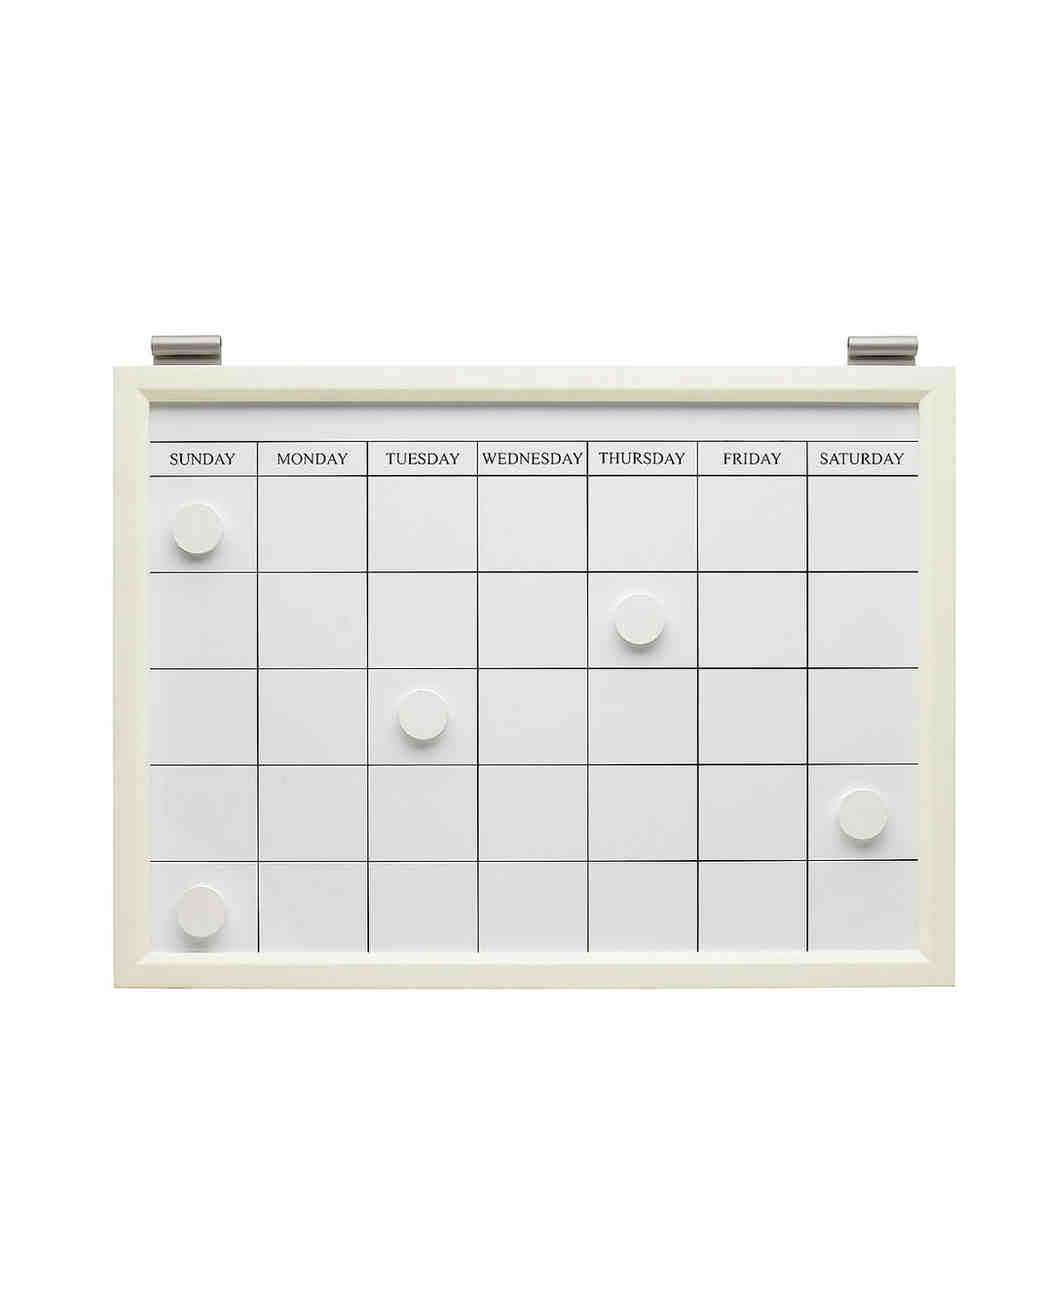 blueprint-team-cleaning-registry-magnetic-whiteboard-calendar-1015.jpg